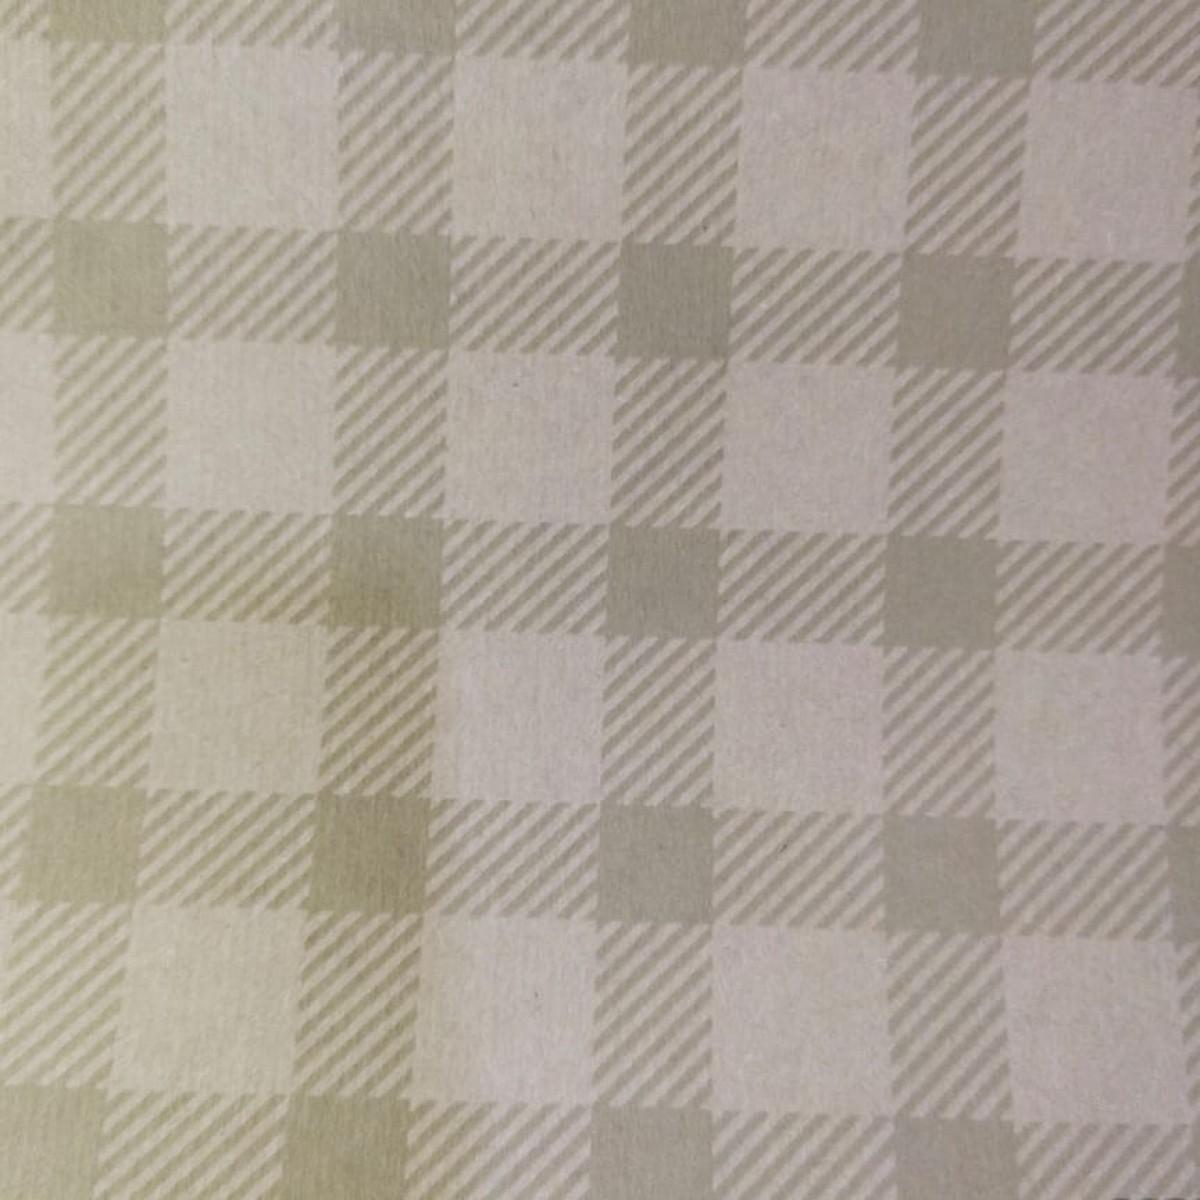 Chex Print Gold 50cmx25m Kraft Paper - 1 Roll